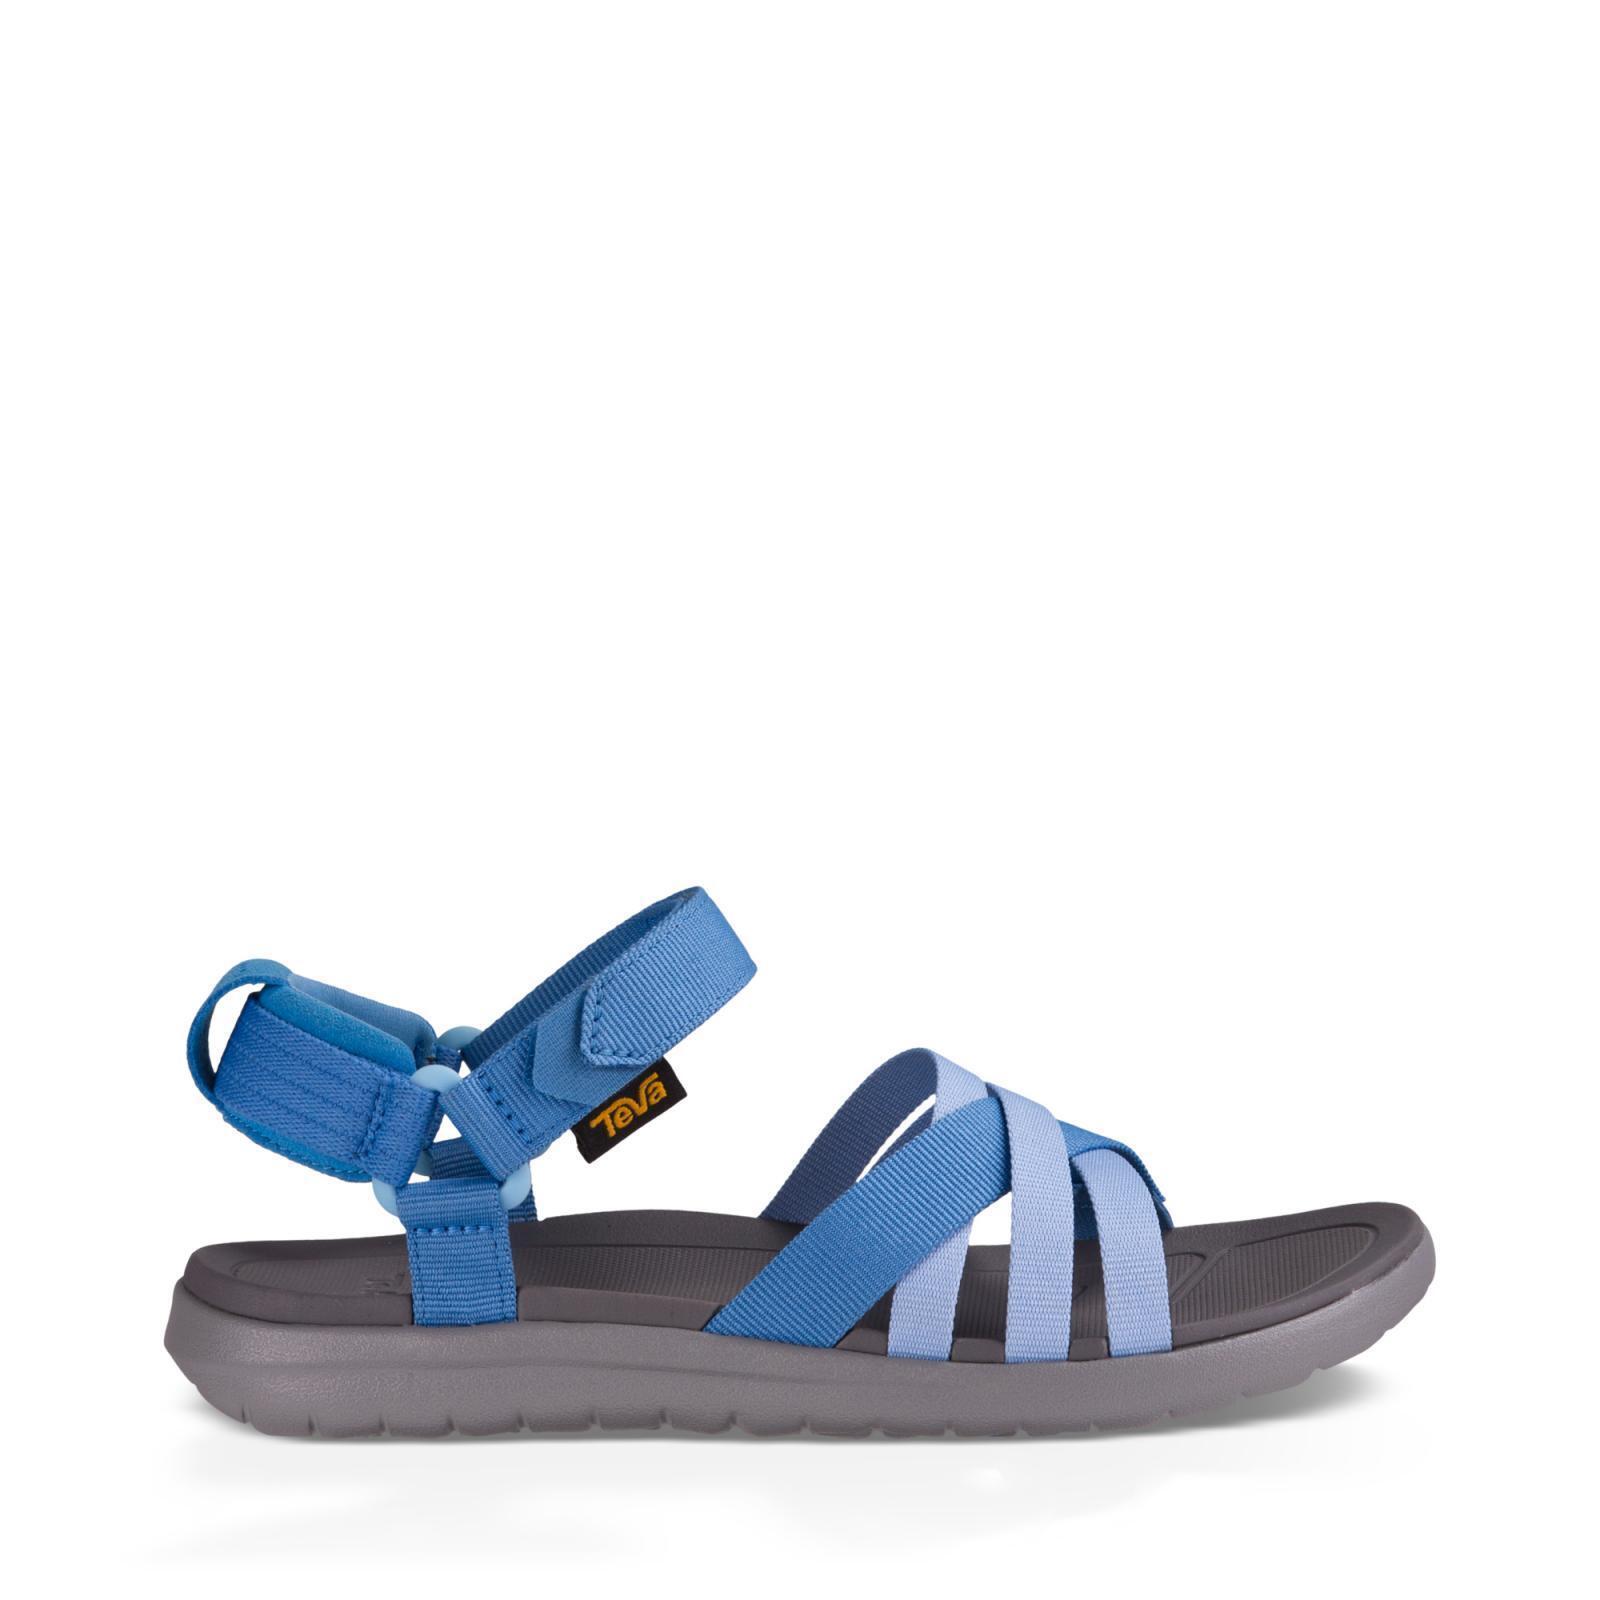 Da Donna Teva  Sanborn Sandalo  Sandali. Blu